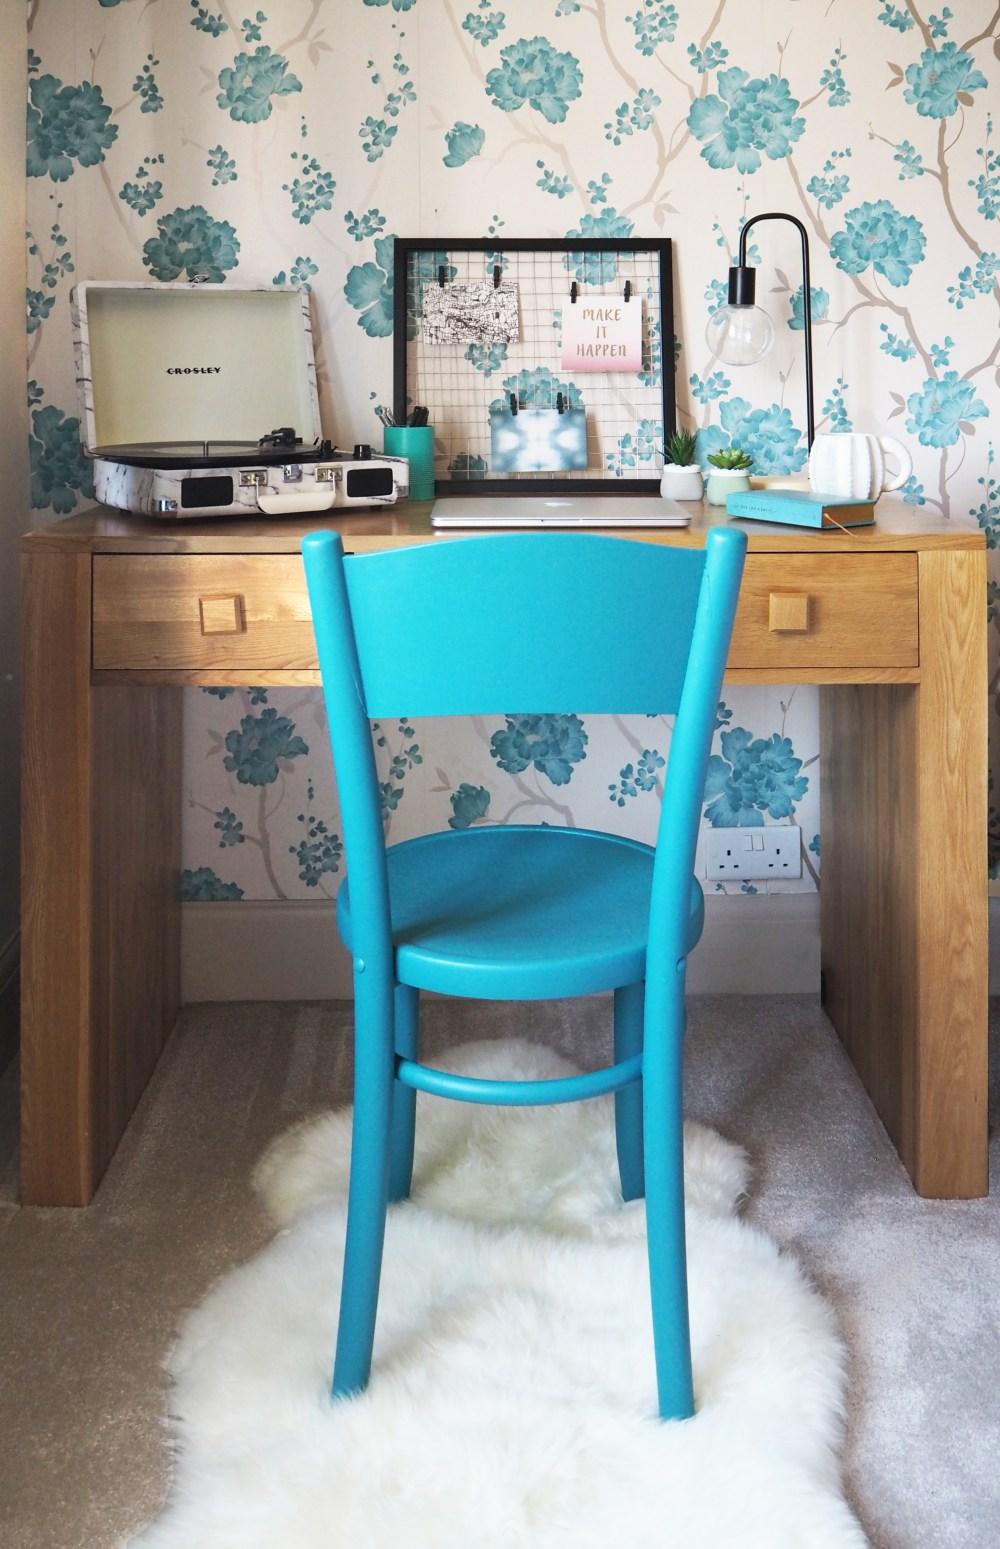 How Valspar Paint helped me update my bedroom